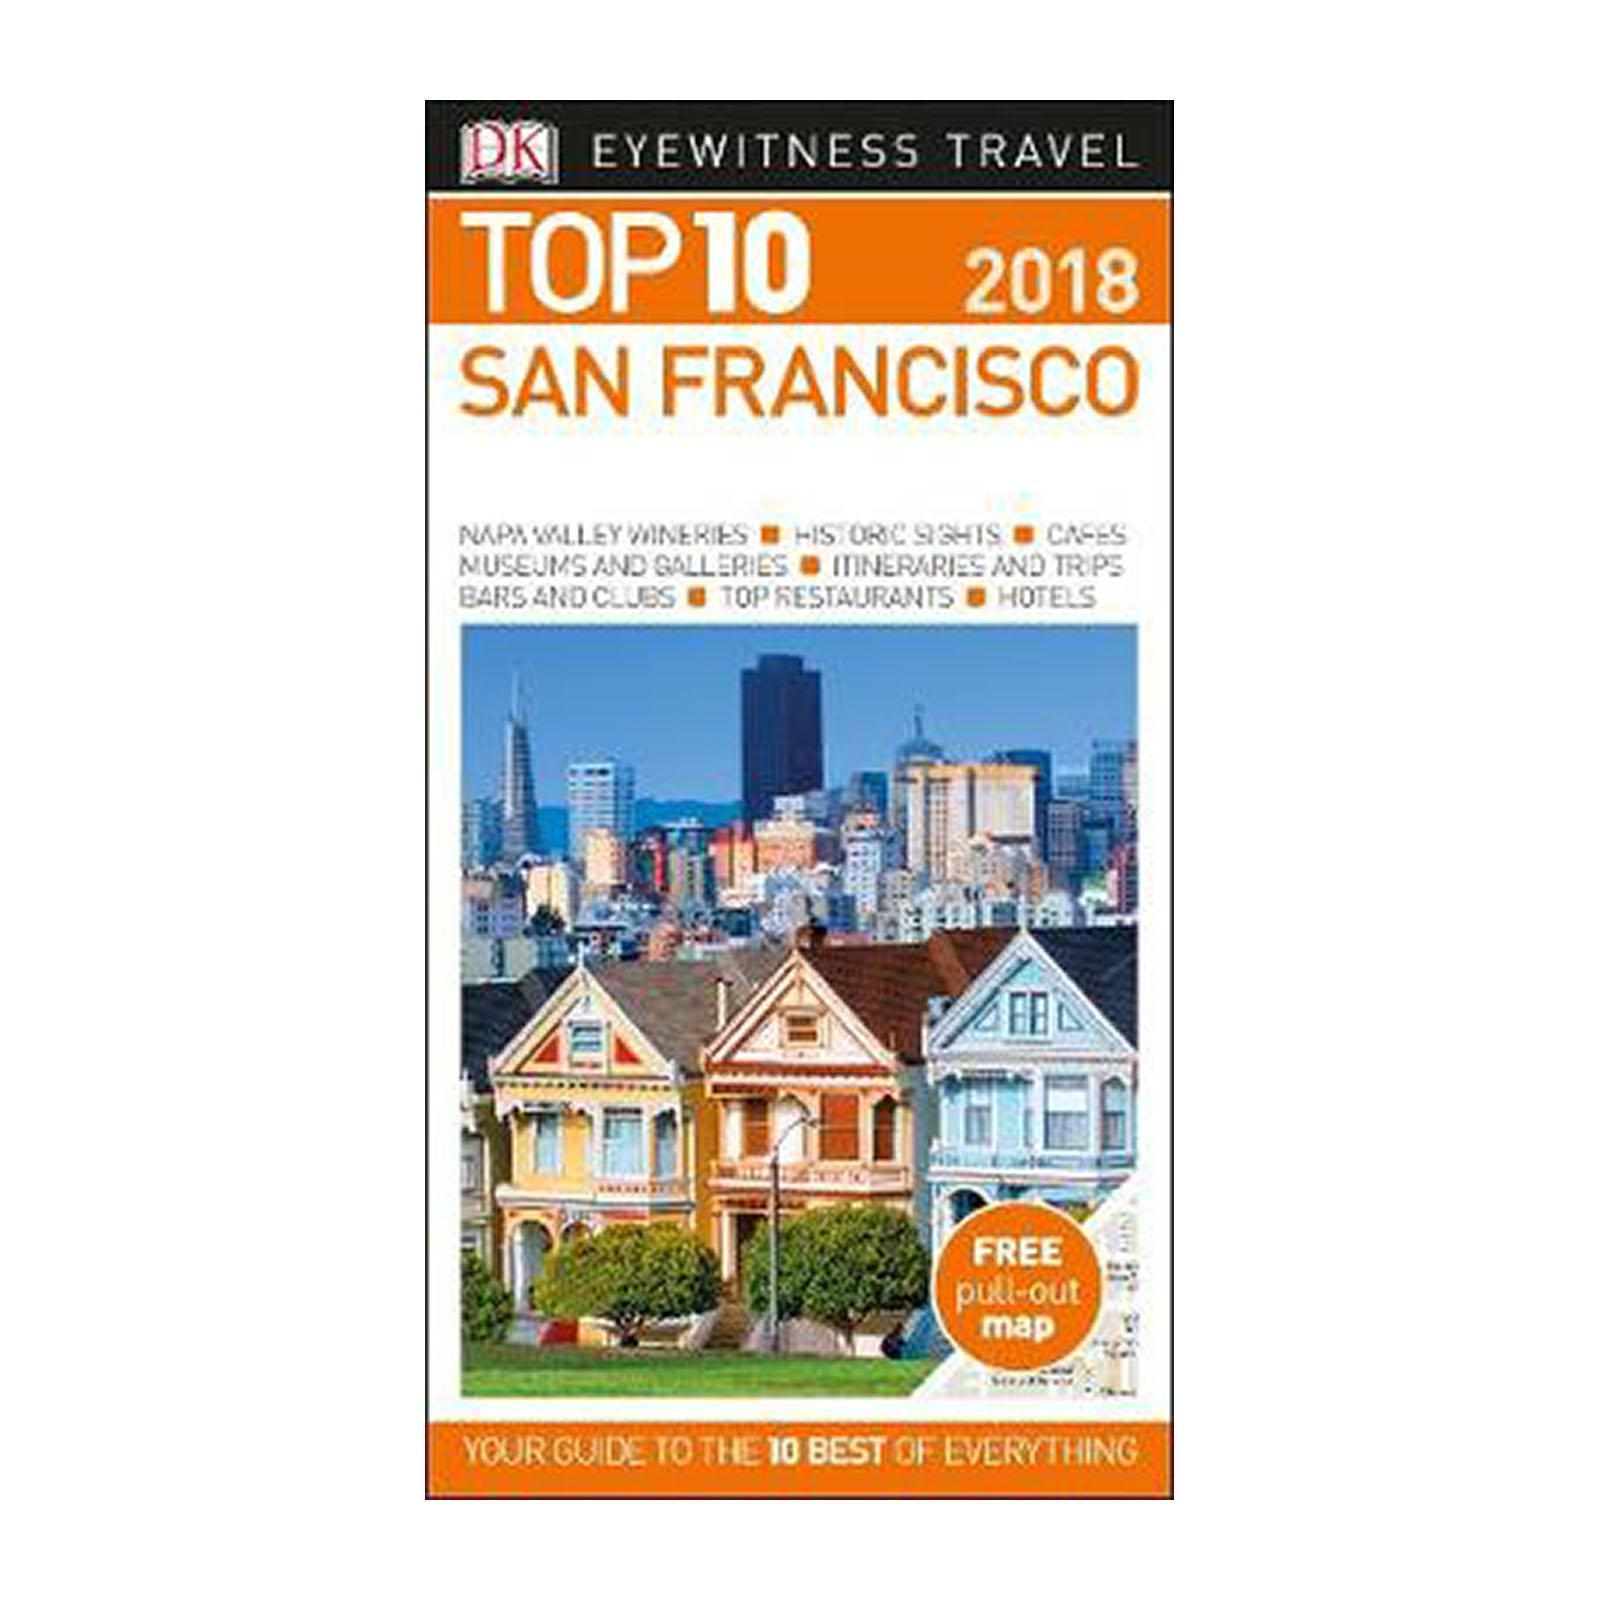 Top 10 San Francisco: 2018 (Paperback)